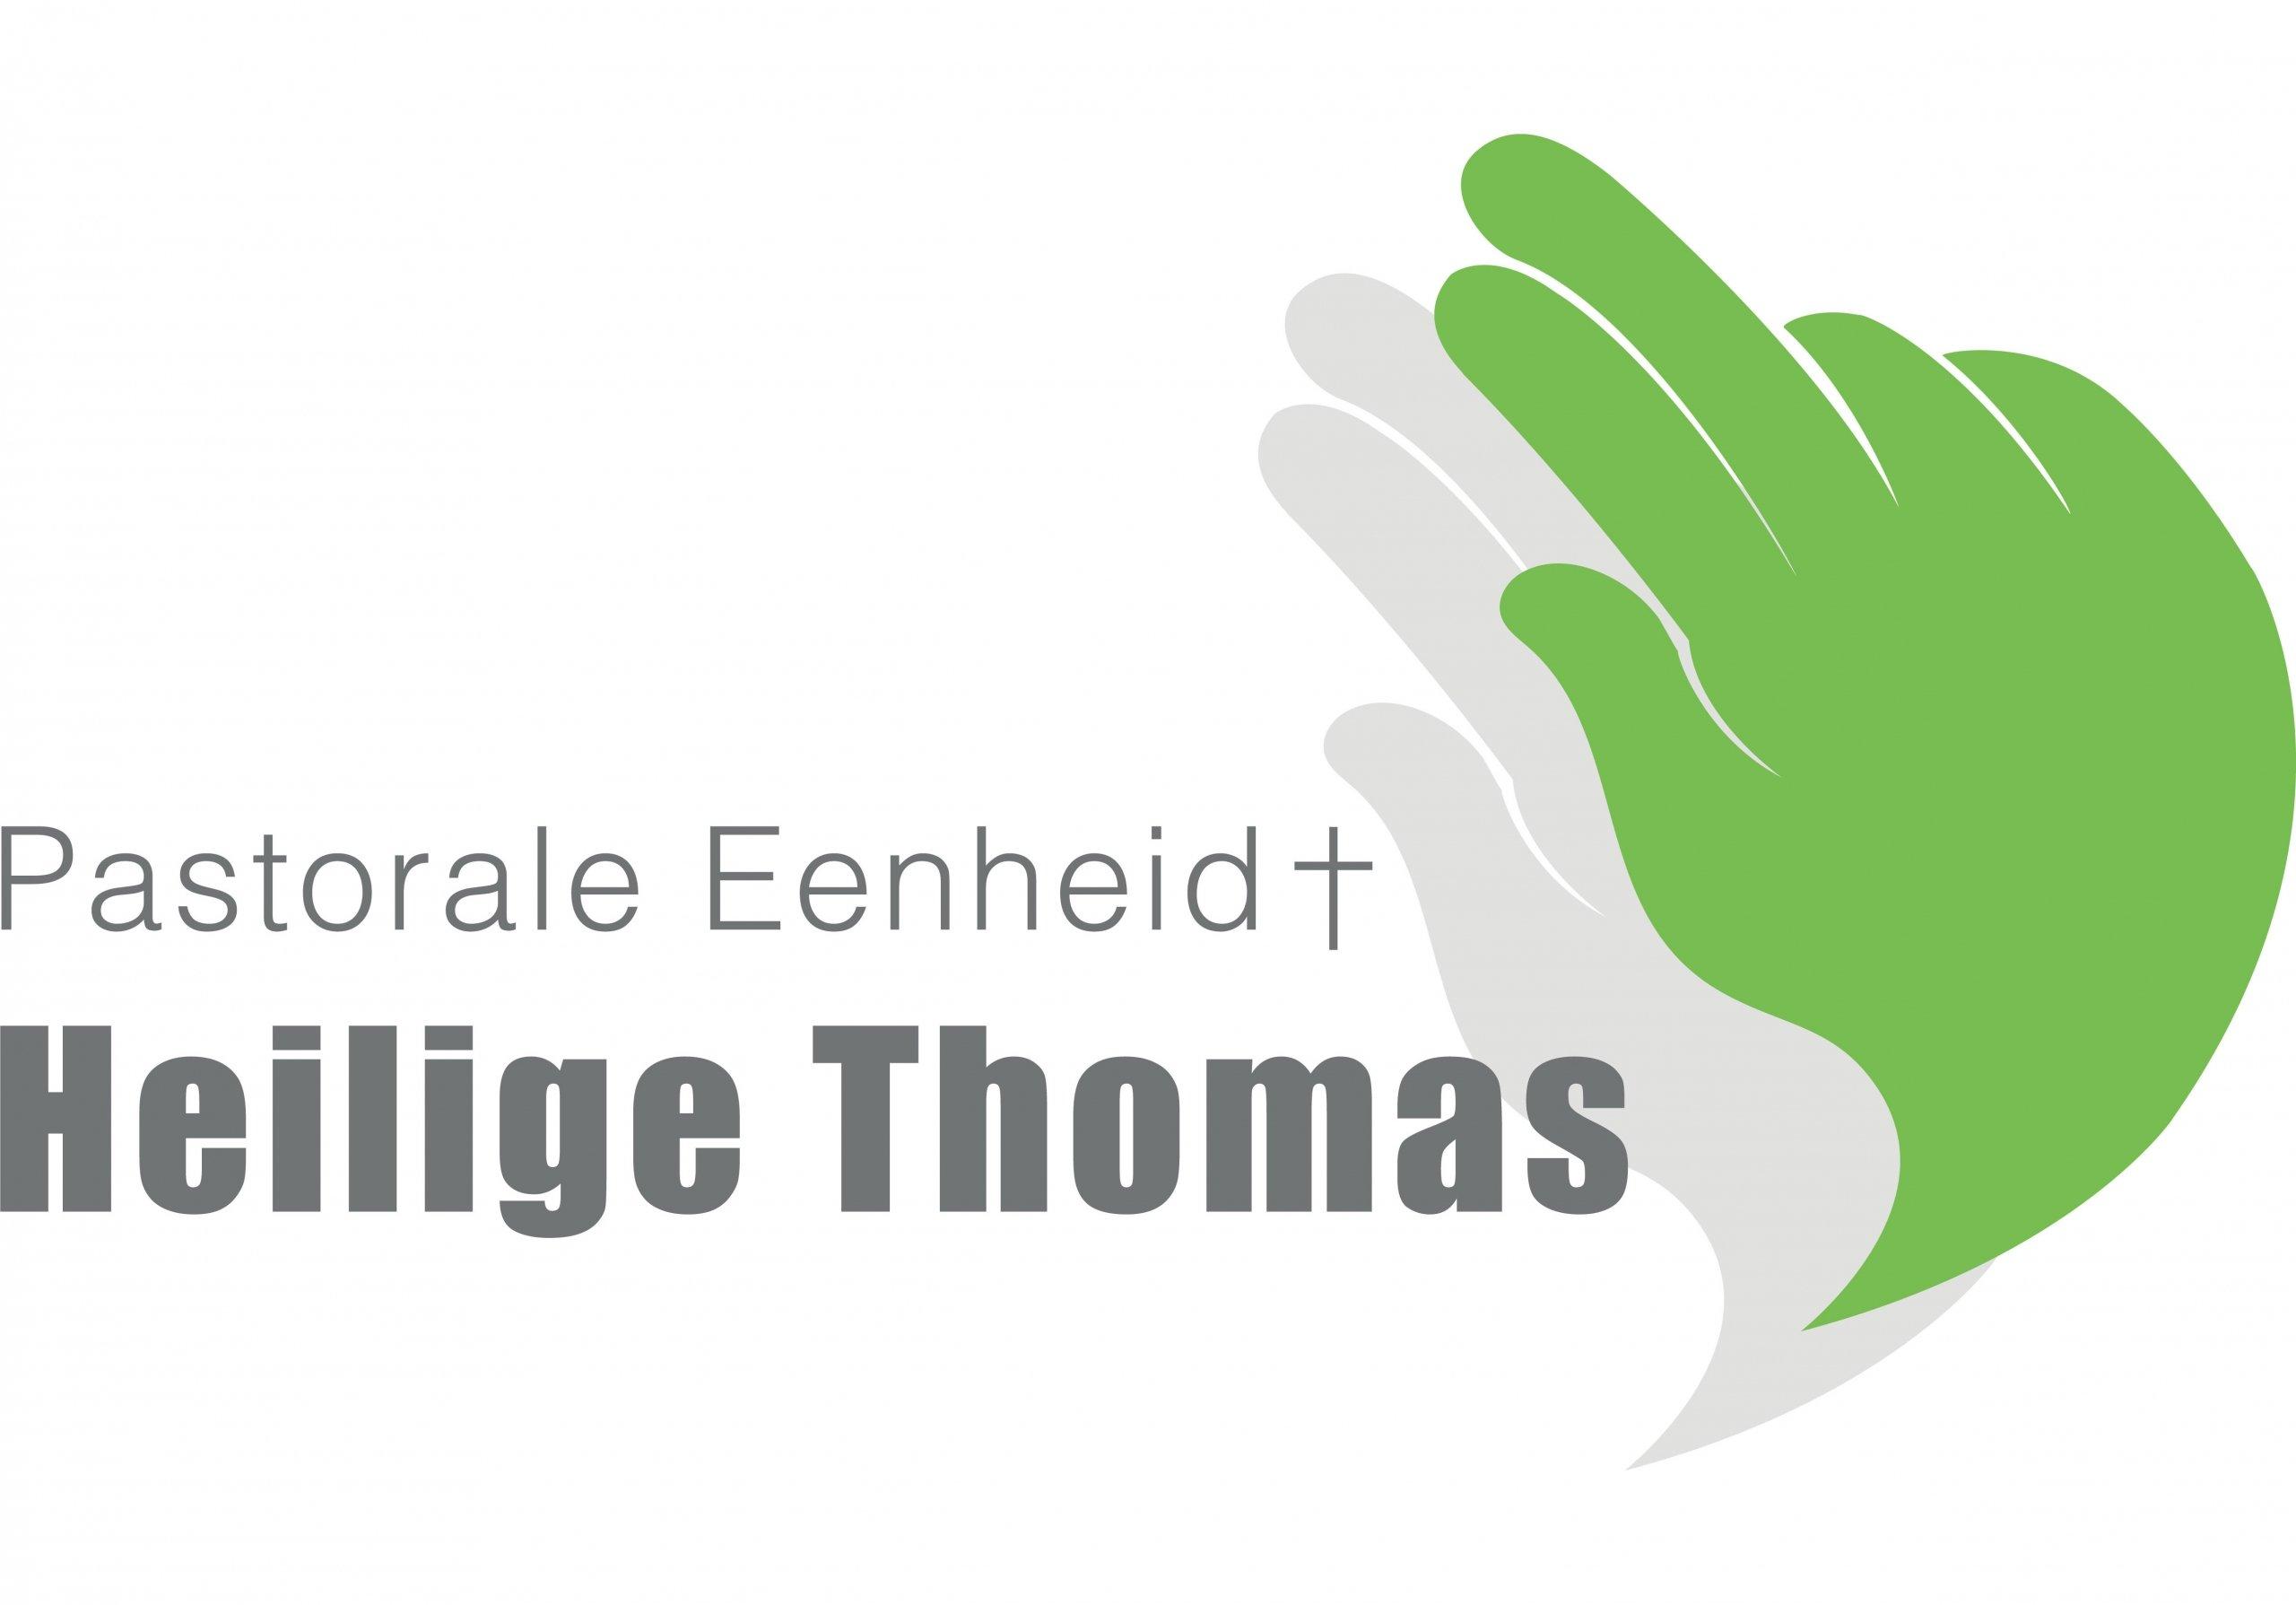 Heilige Thomas